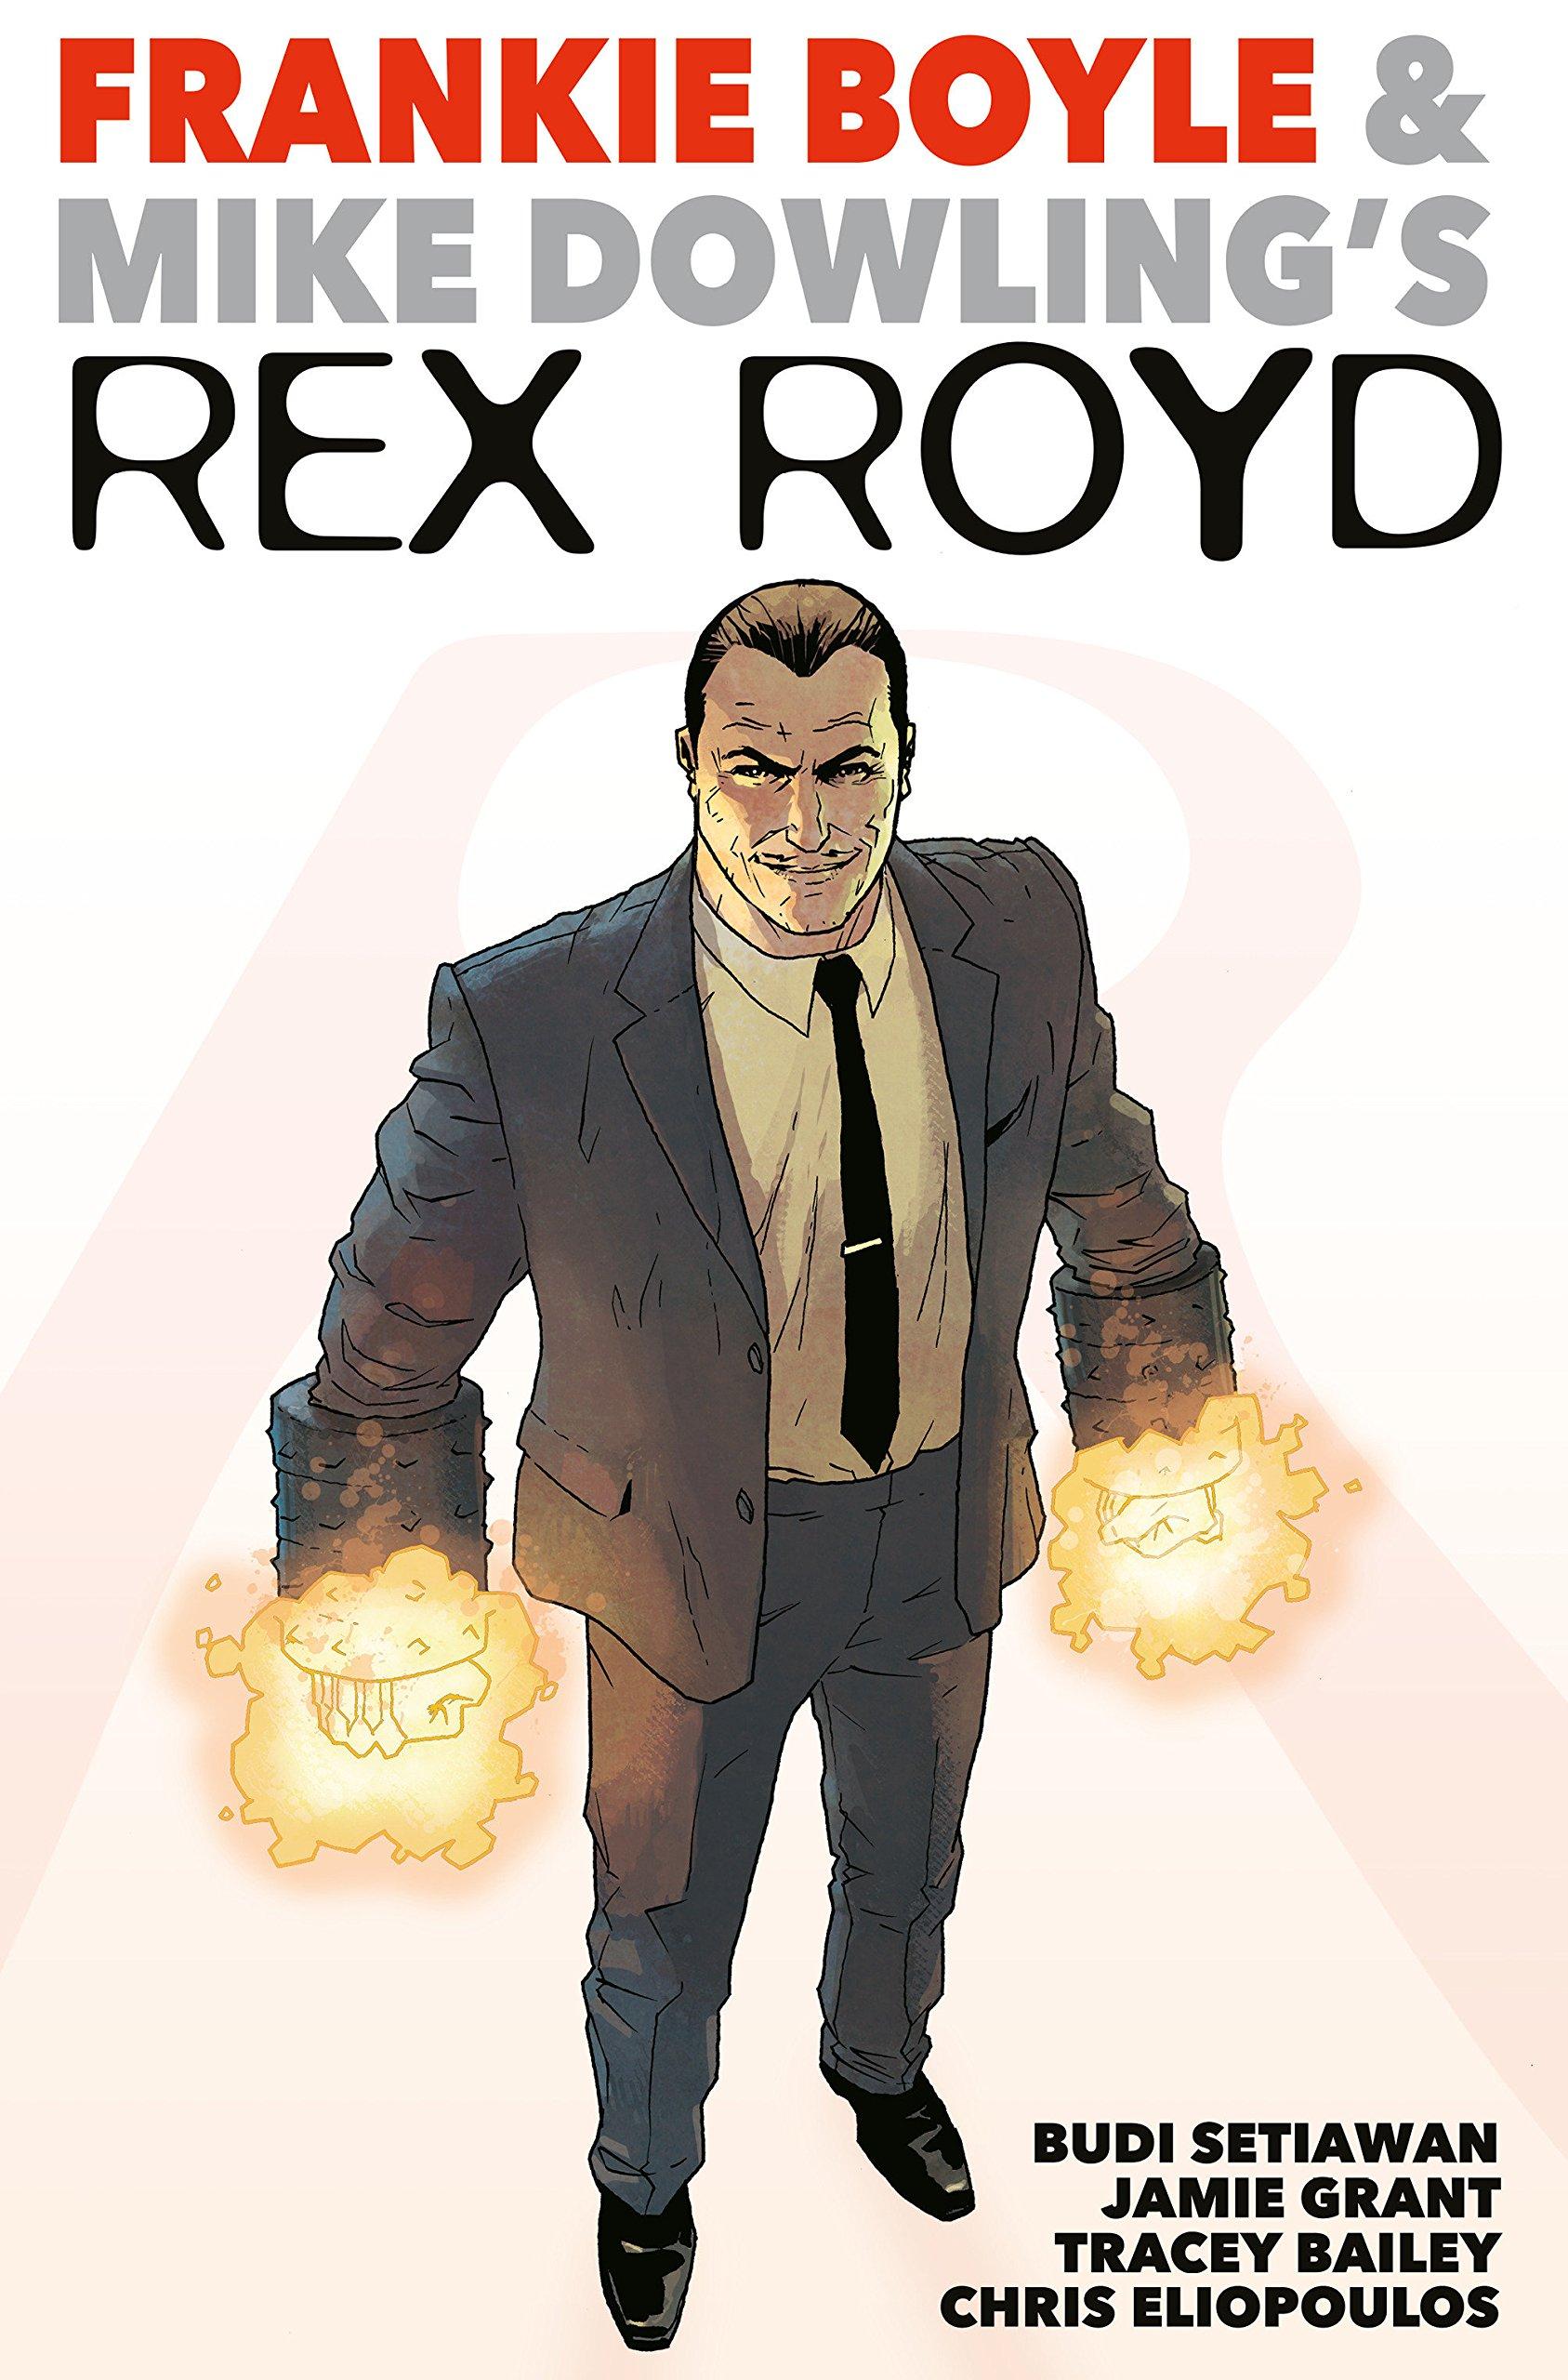 Rex Royd: Amazon.es: Boyle, Frankie, Muir, Jim, Dowling, Mike, Setiawan, Budi: Libros en idiomas extranjeros